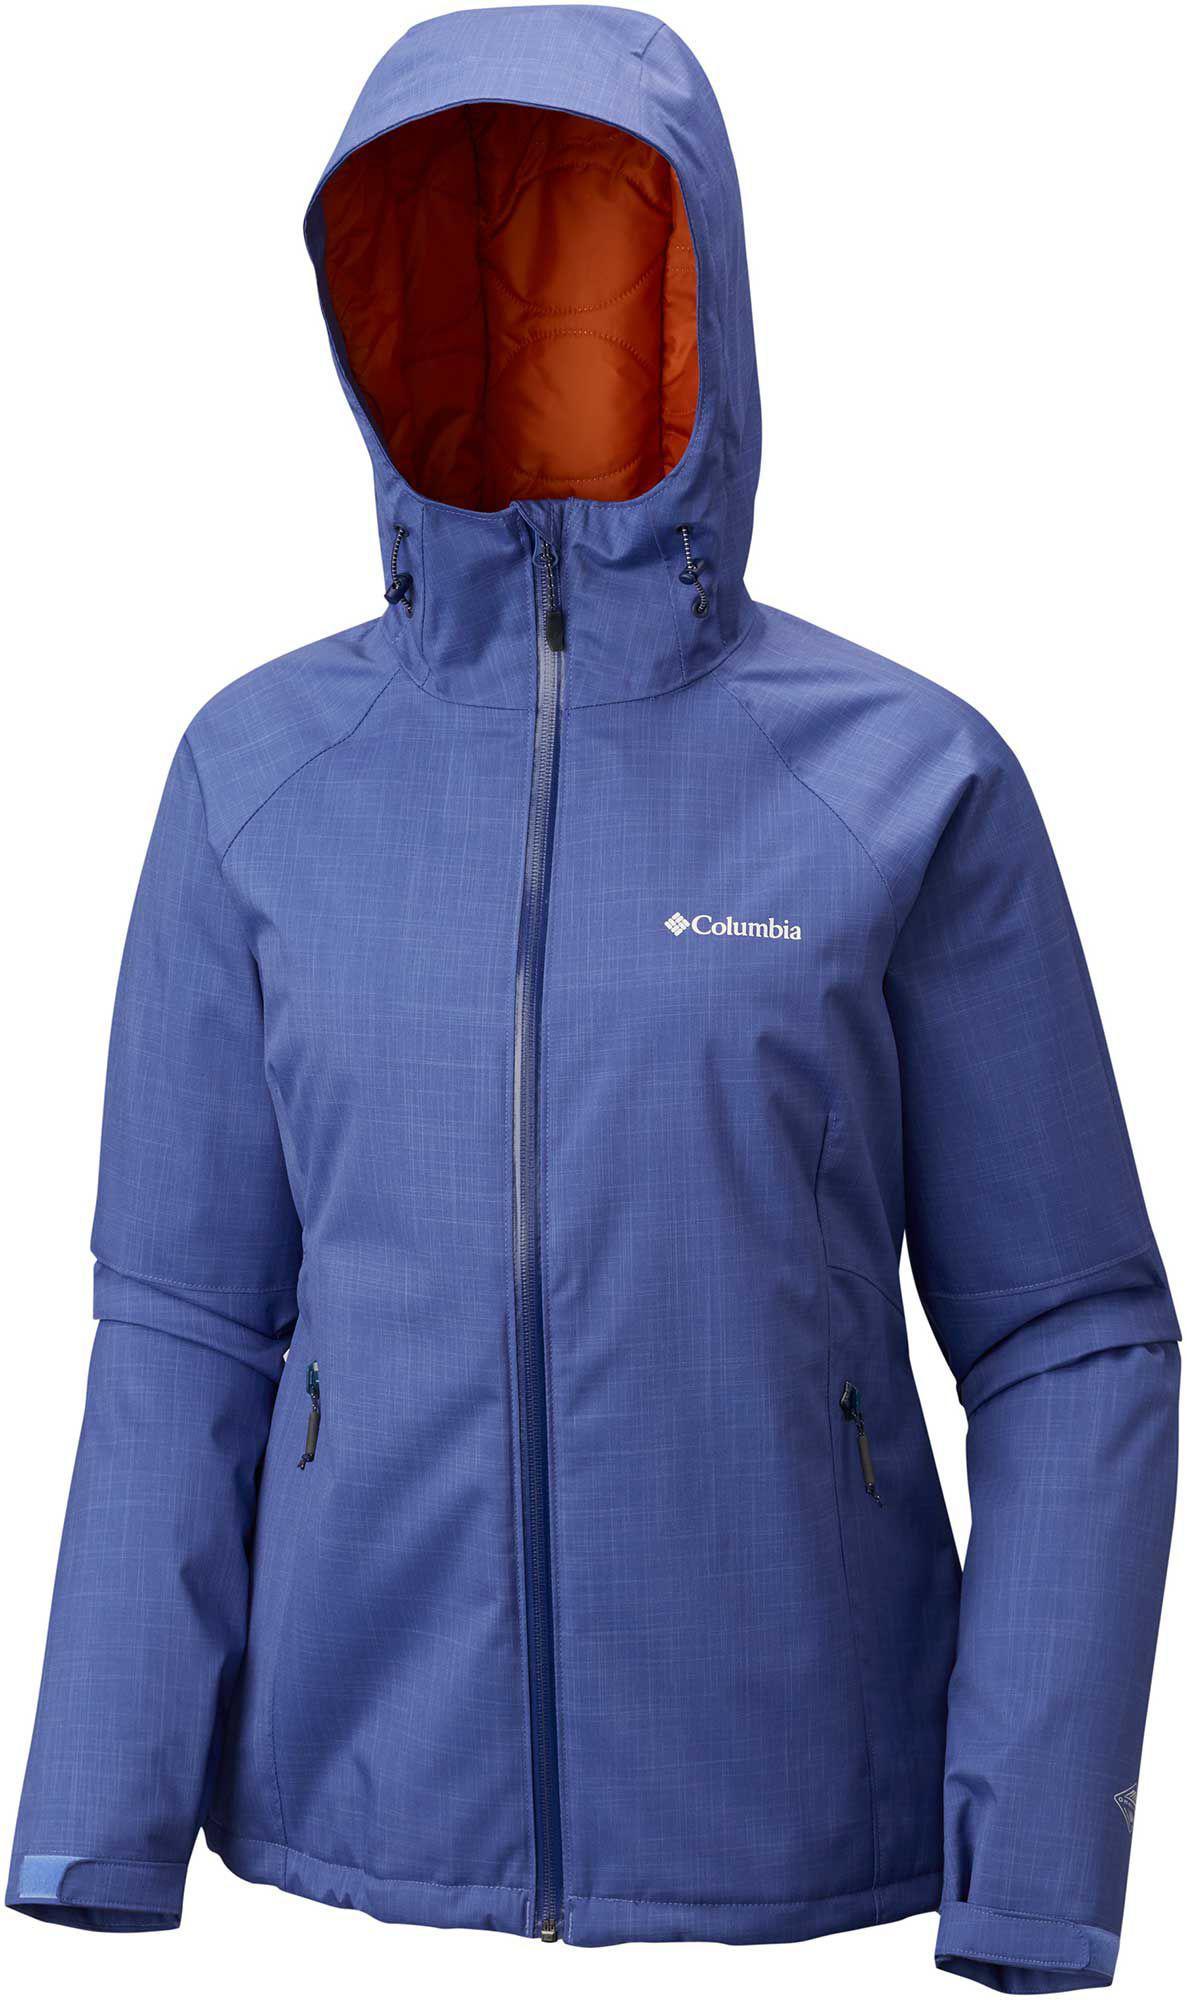 Columbia Top Pine Insulated Rain Jacket